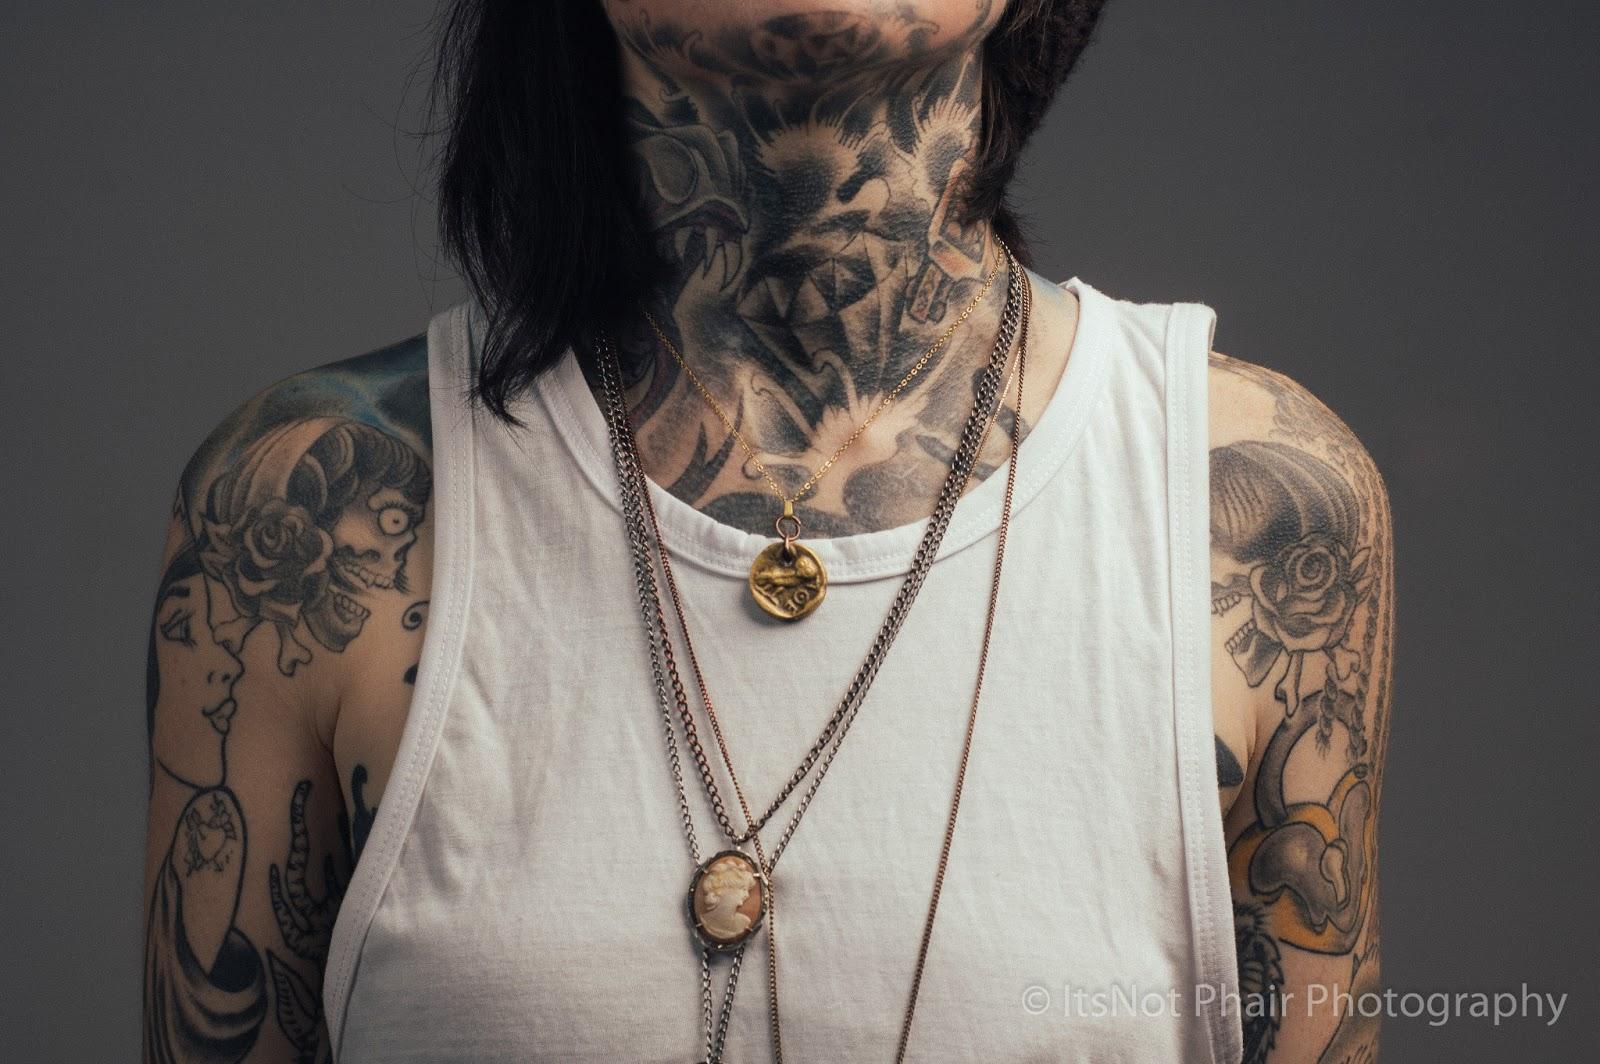 Lifeline Tattoo Forever.blacksheep: july 2013